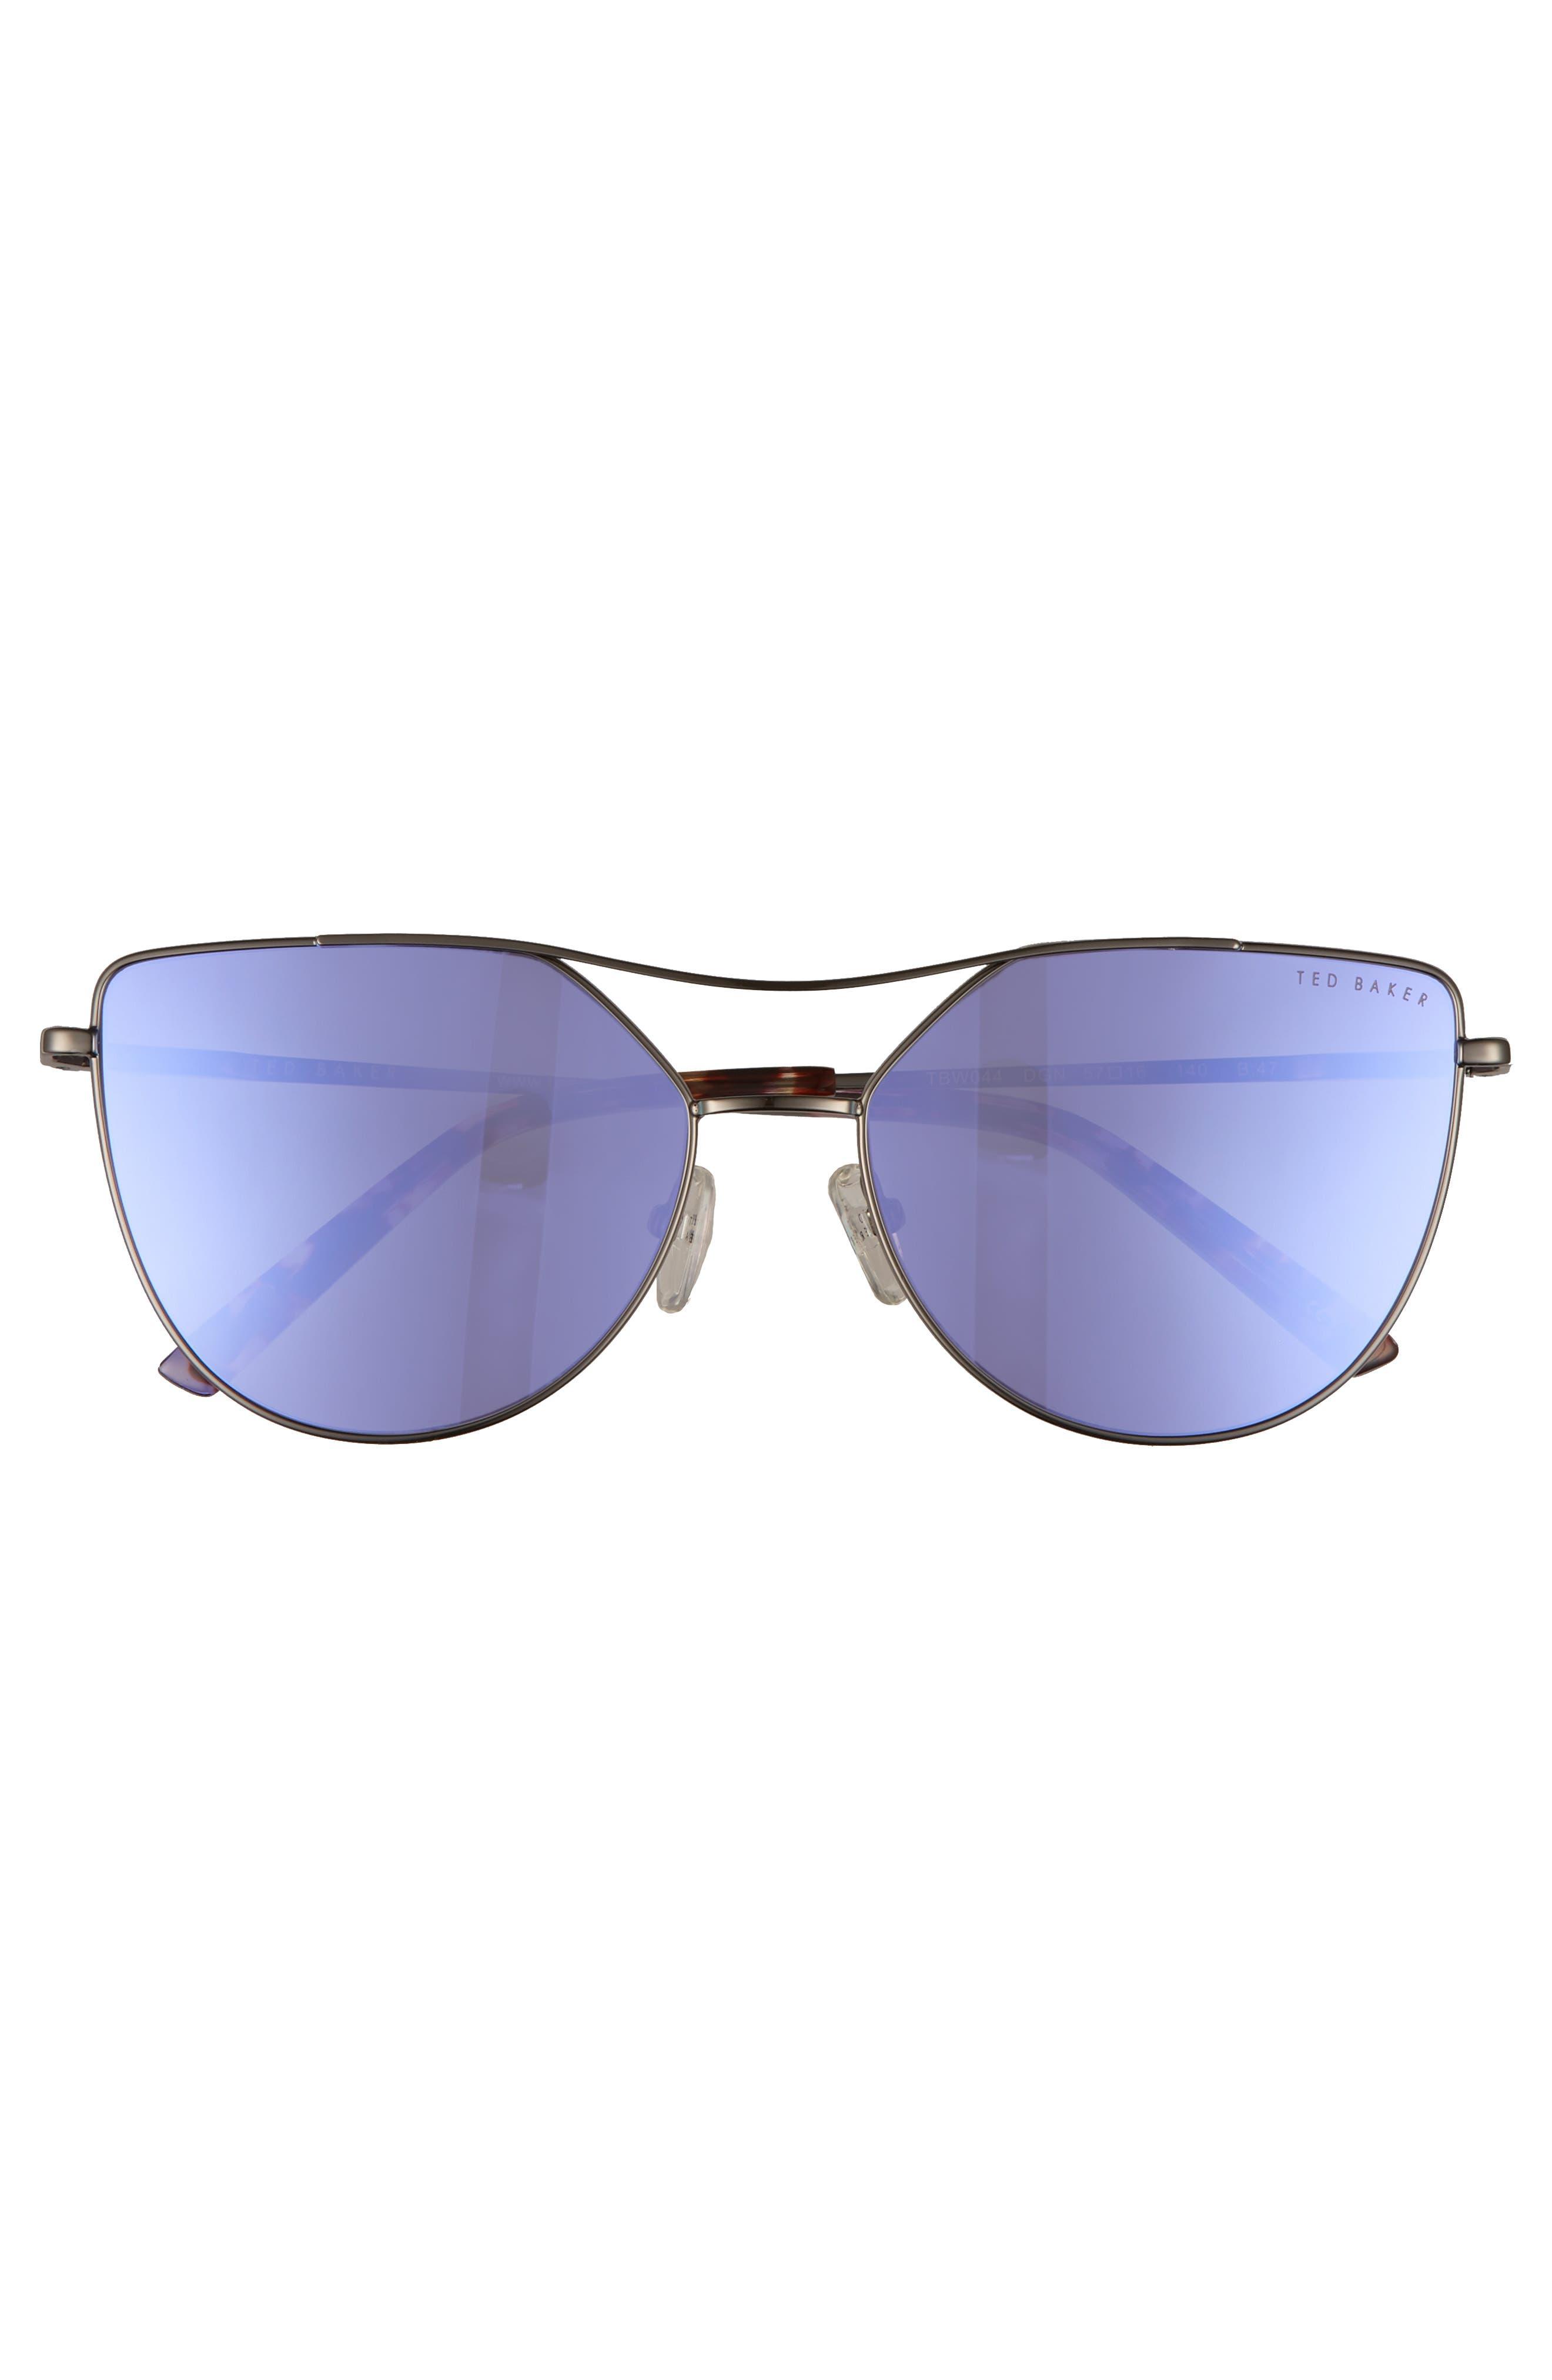 57mm Geometric Aviator Sunglasses,                             Alternate thumbnail 2, color,                             Dark Gunmetal